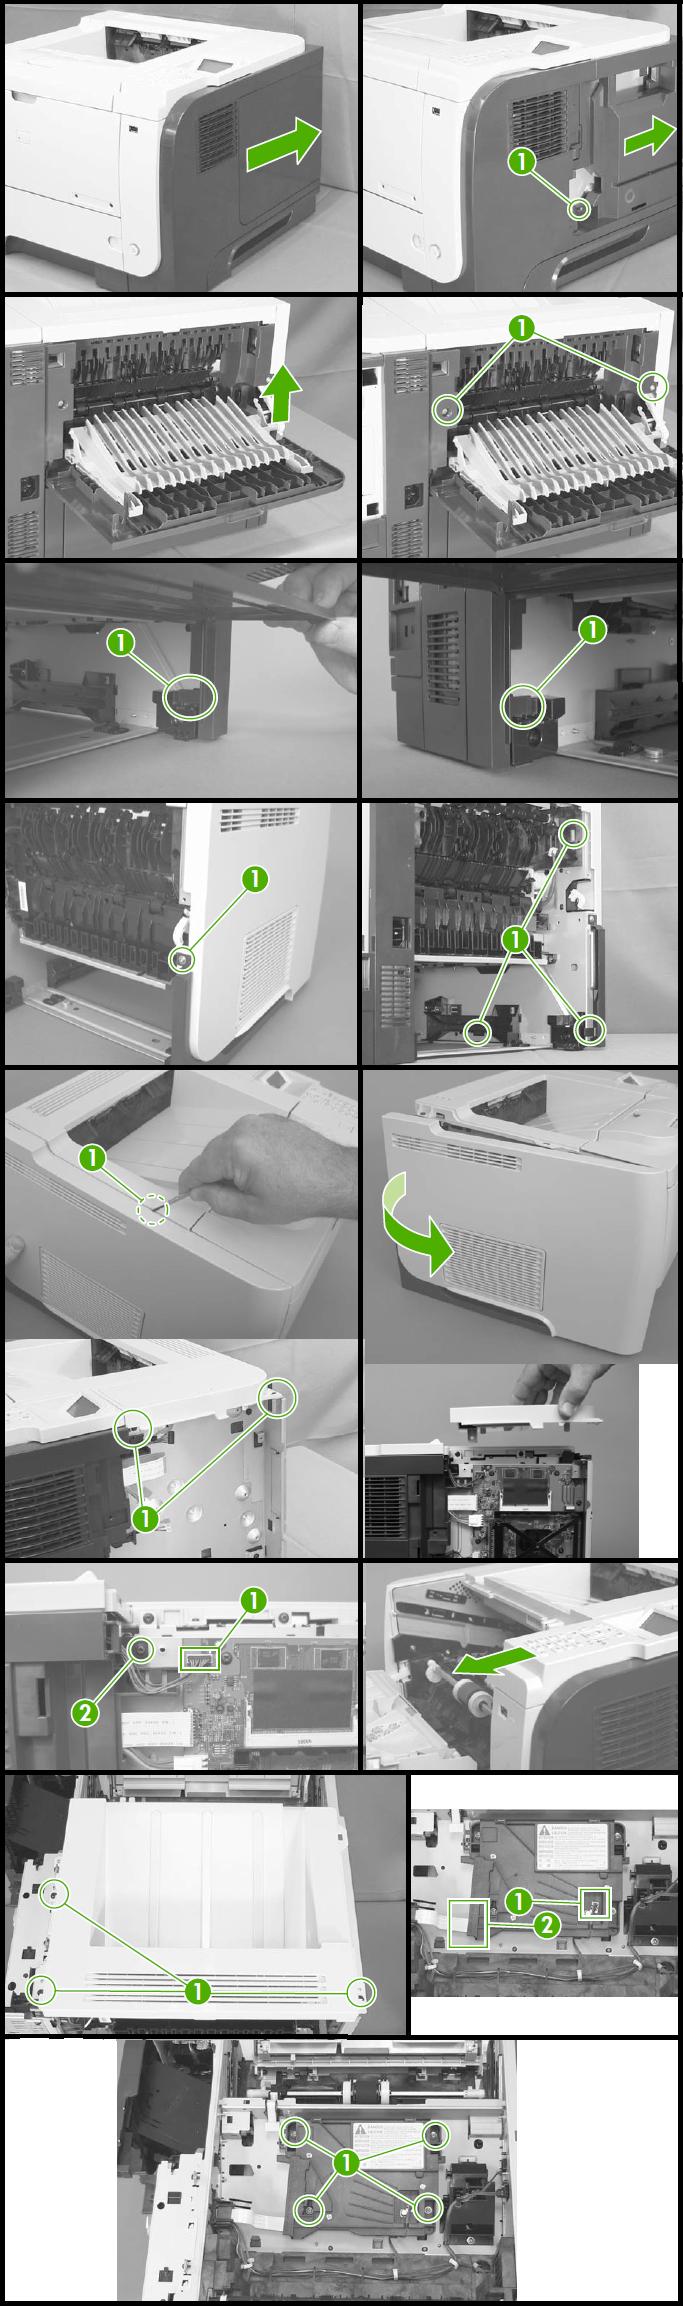 5110 error hp laserjet p3015 printer laser scanner error 5110 error hp laserjet p3015 printer laser scanner error fandeluxe Images